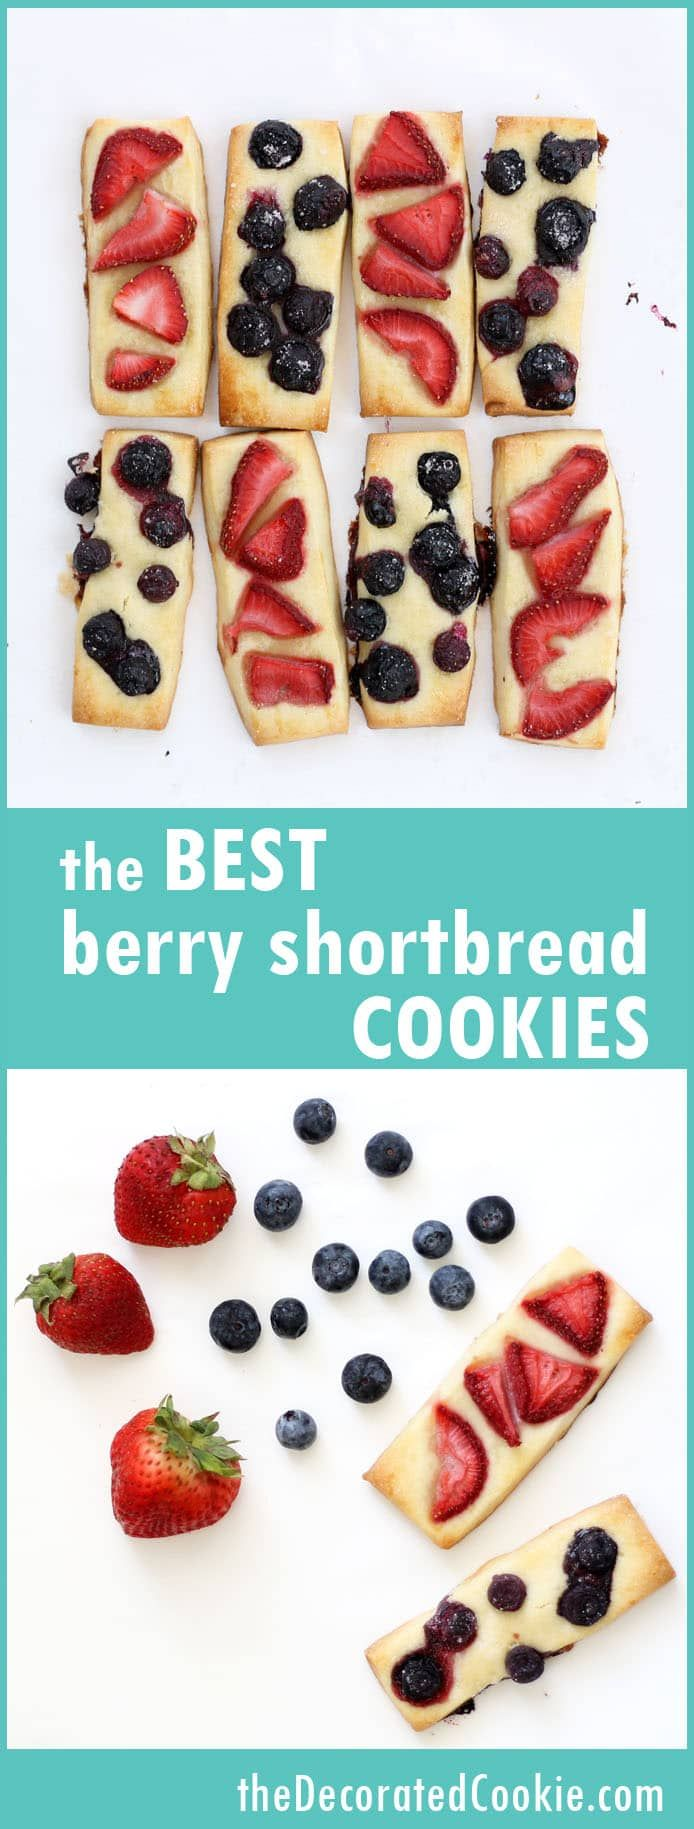 the BEST berry shortbread cookies ever, great Summer dessert